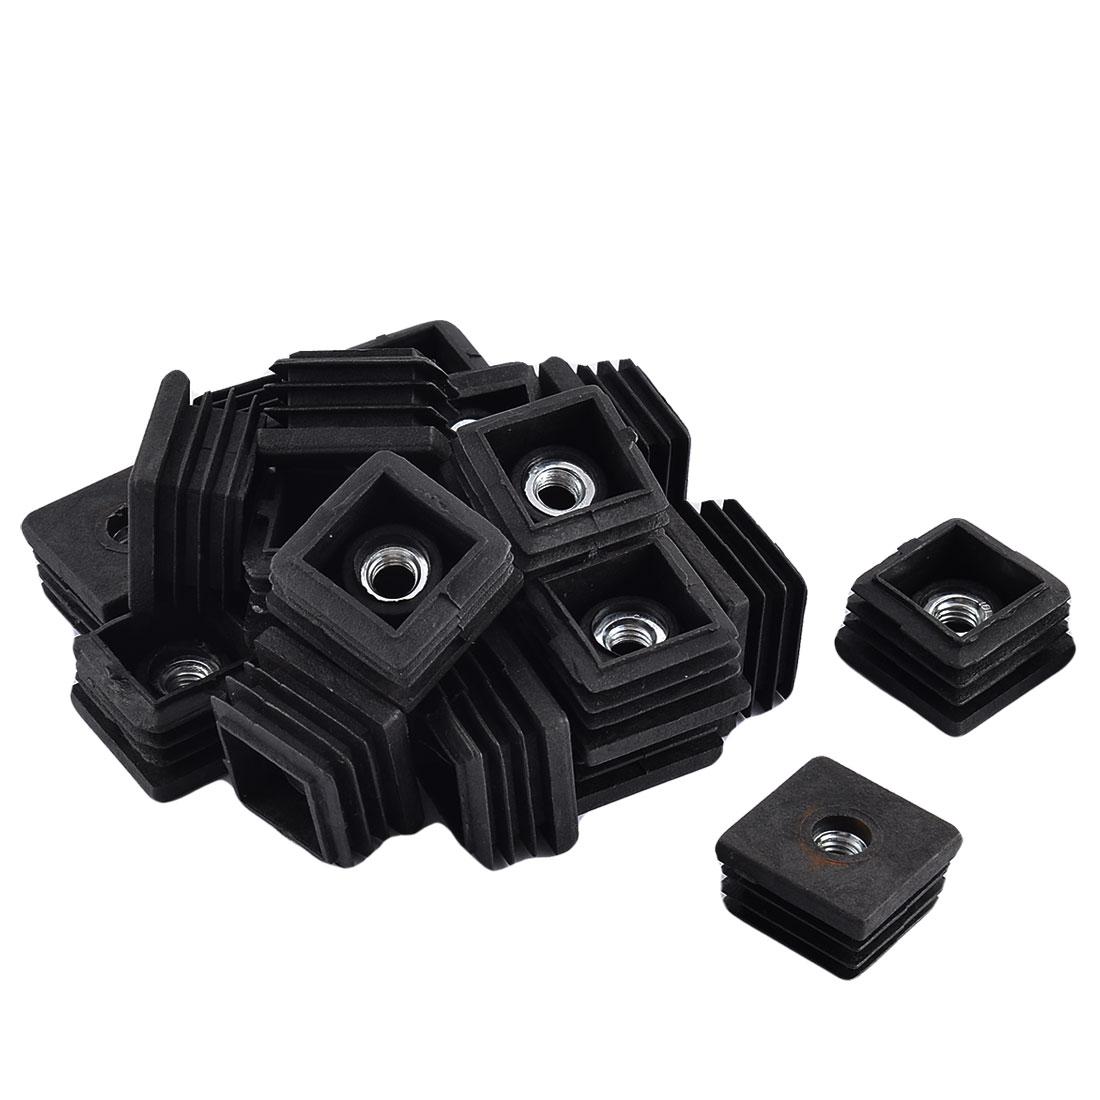 Home Office Plastic Square Shaped Furniture Table Foot Tube Nut Insert Black 20 Pcs